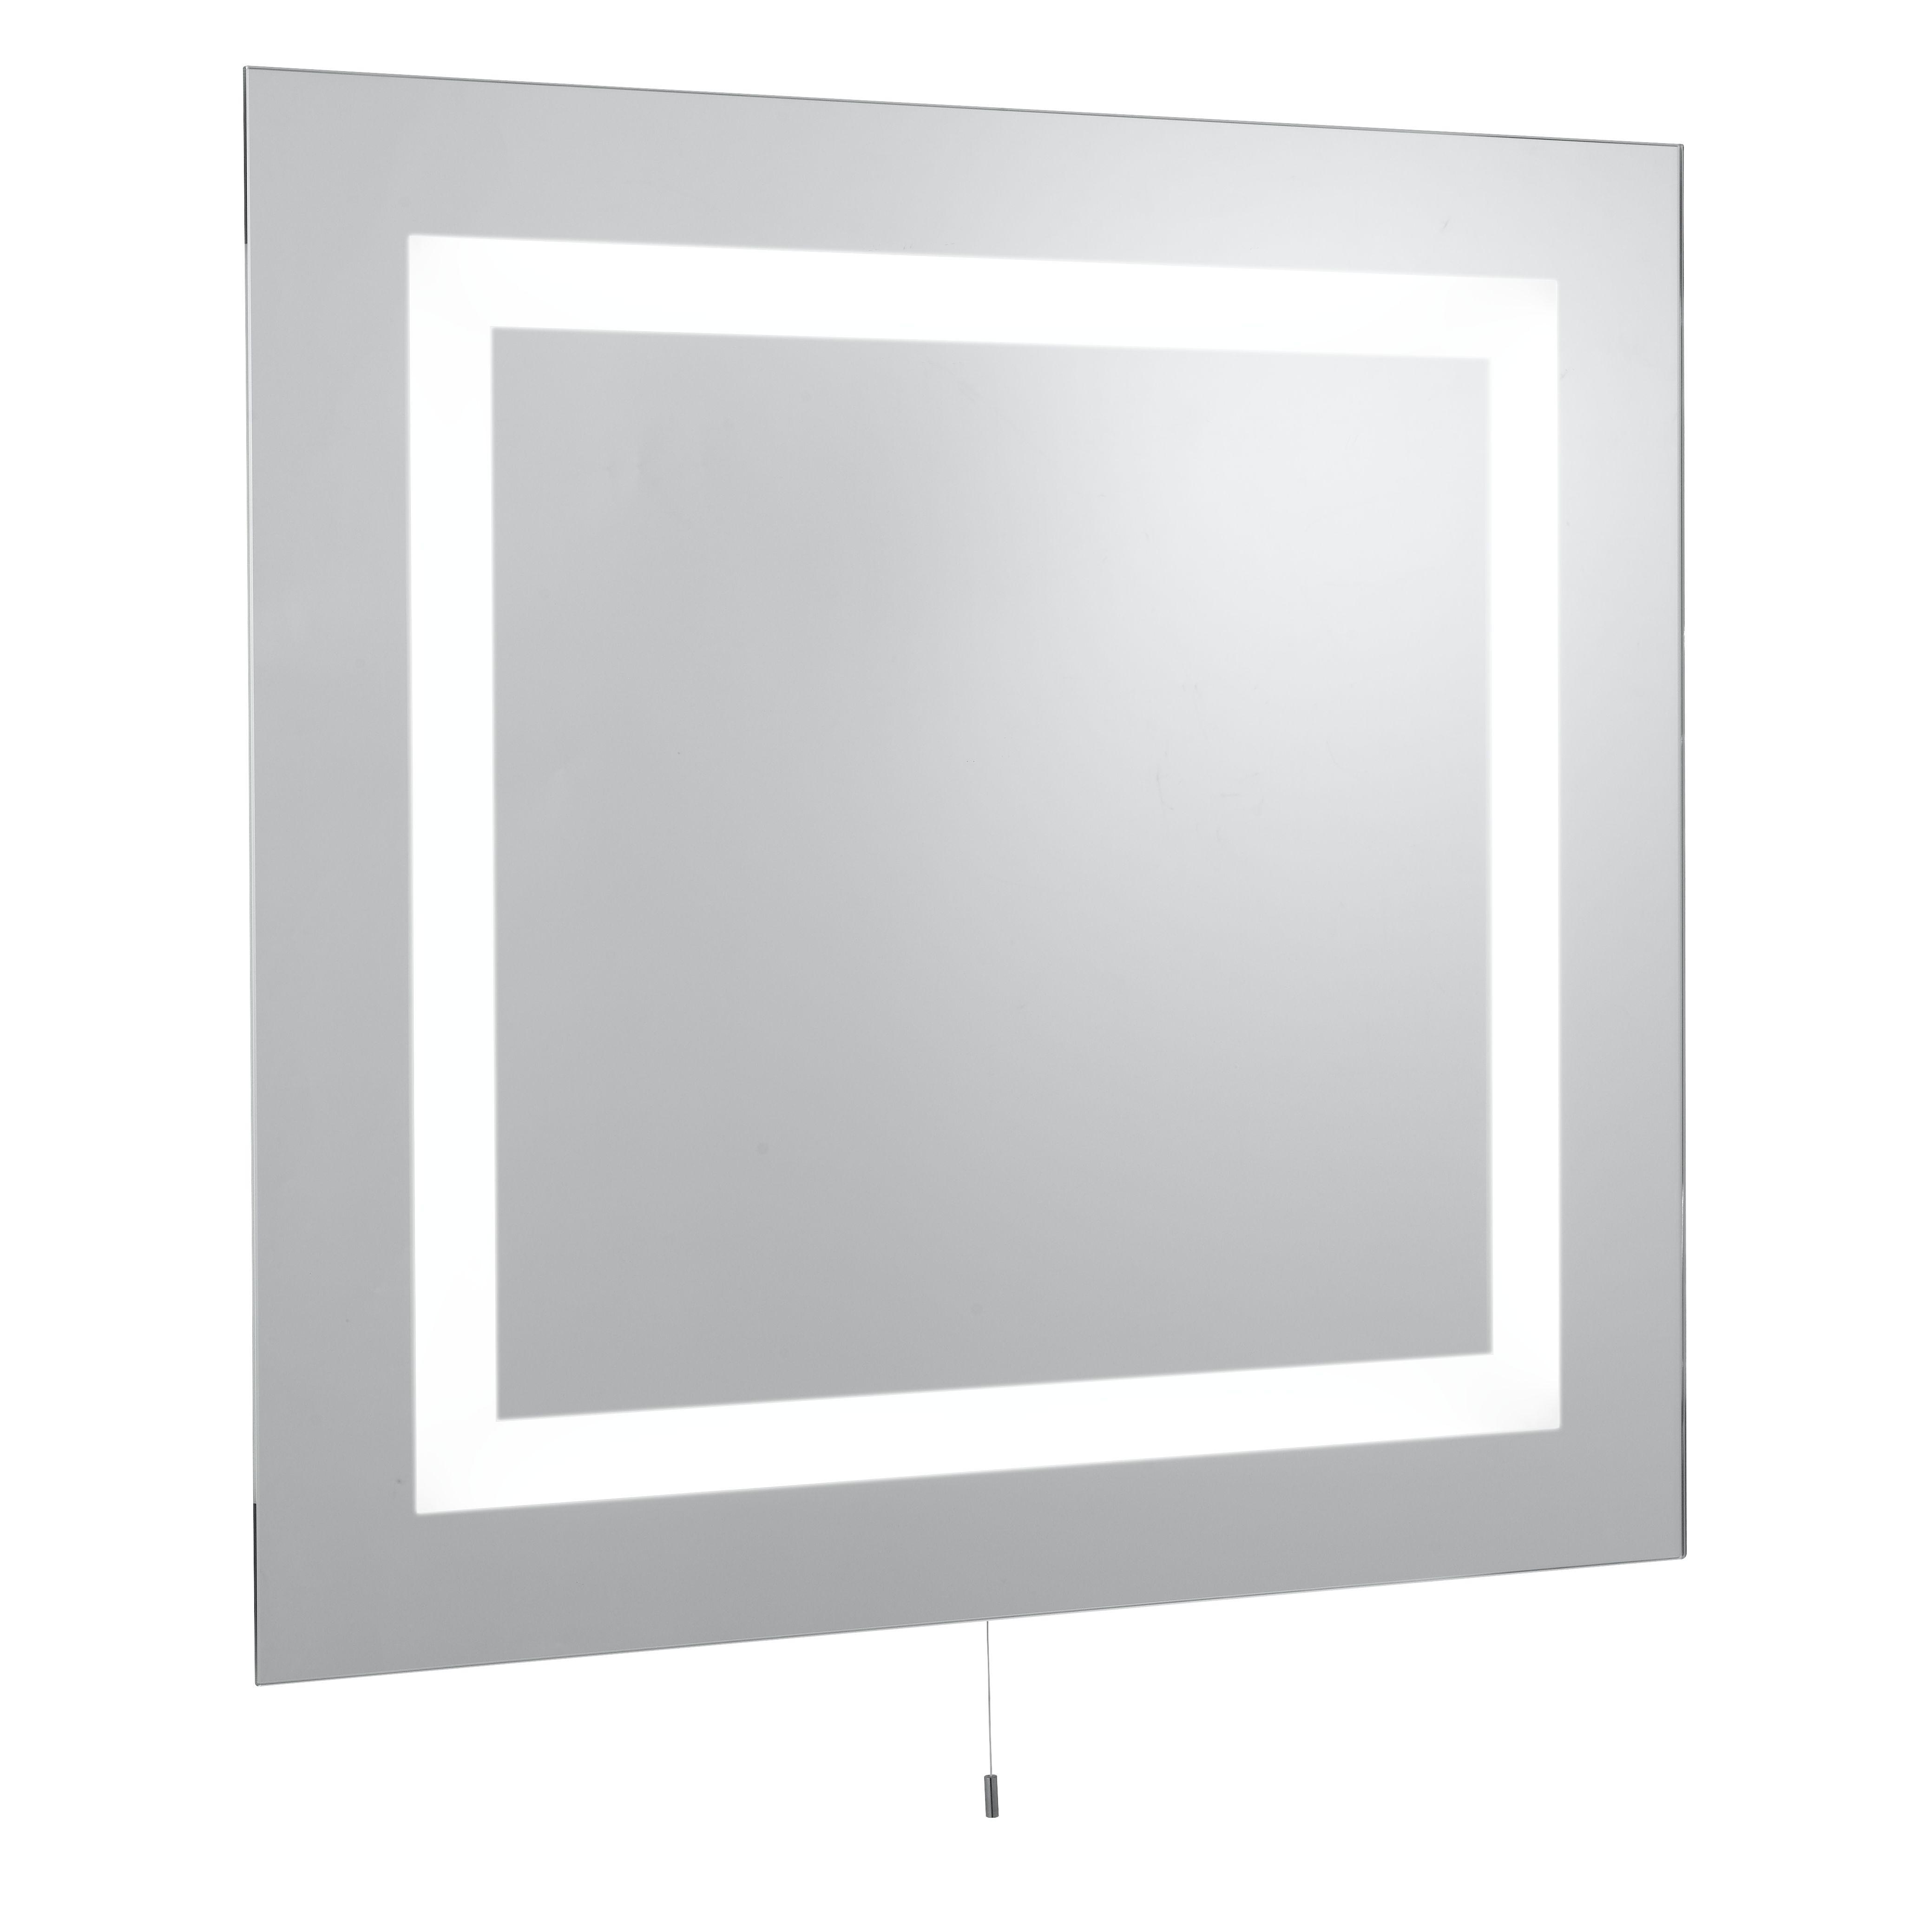 Square Bathroom 4 Light Ip44 Illuminated Mirror, Switched